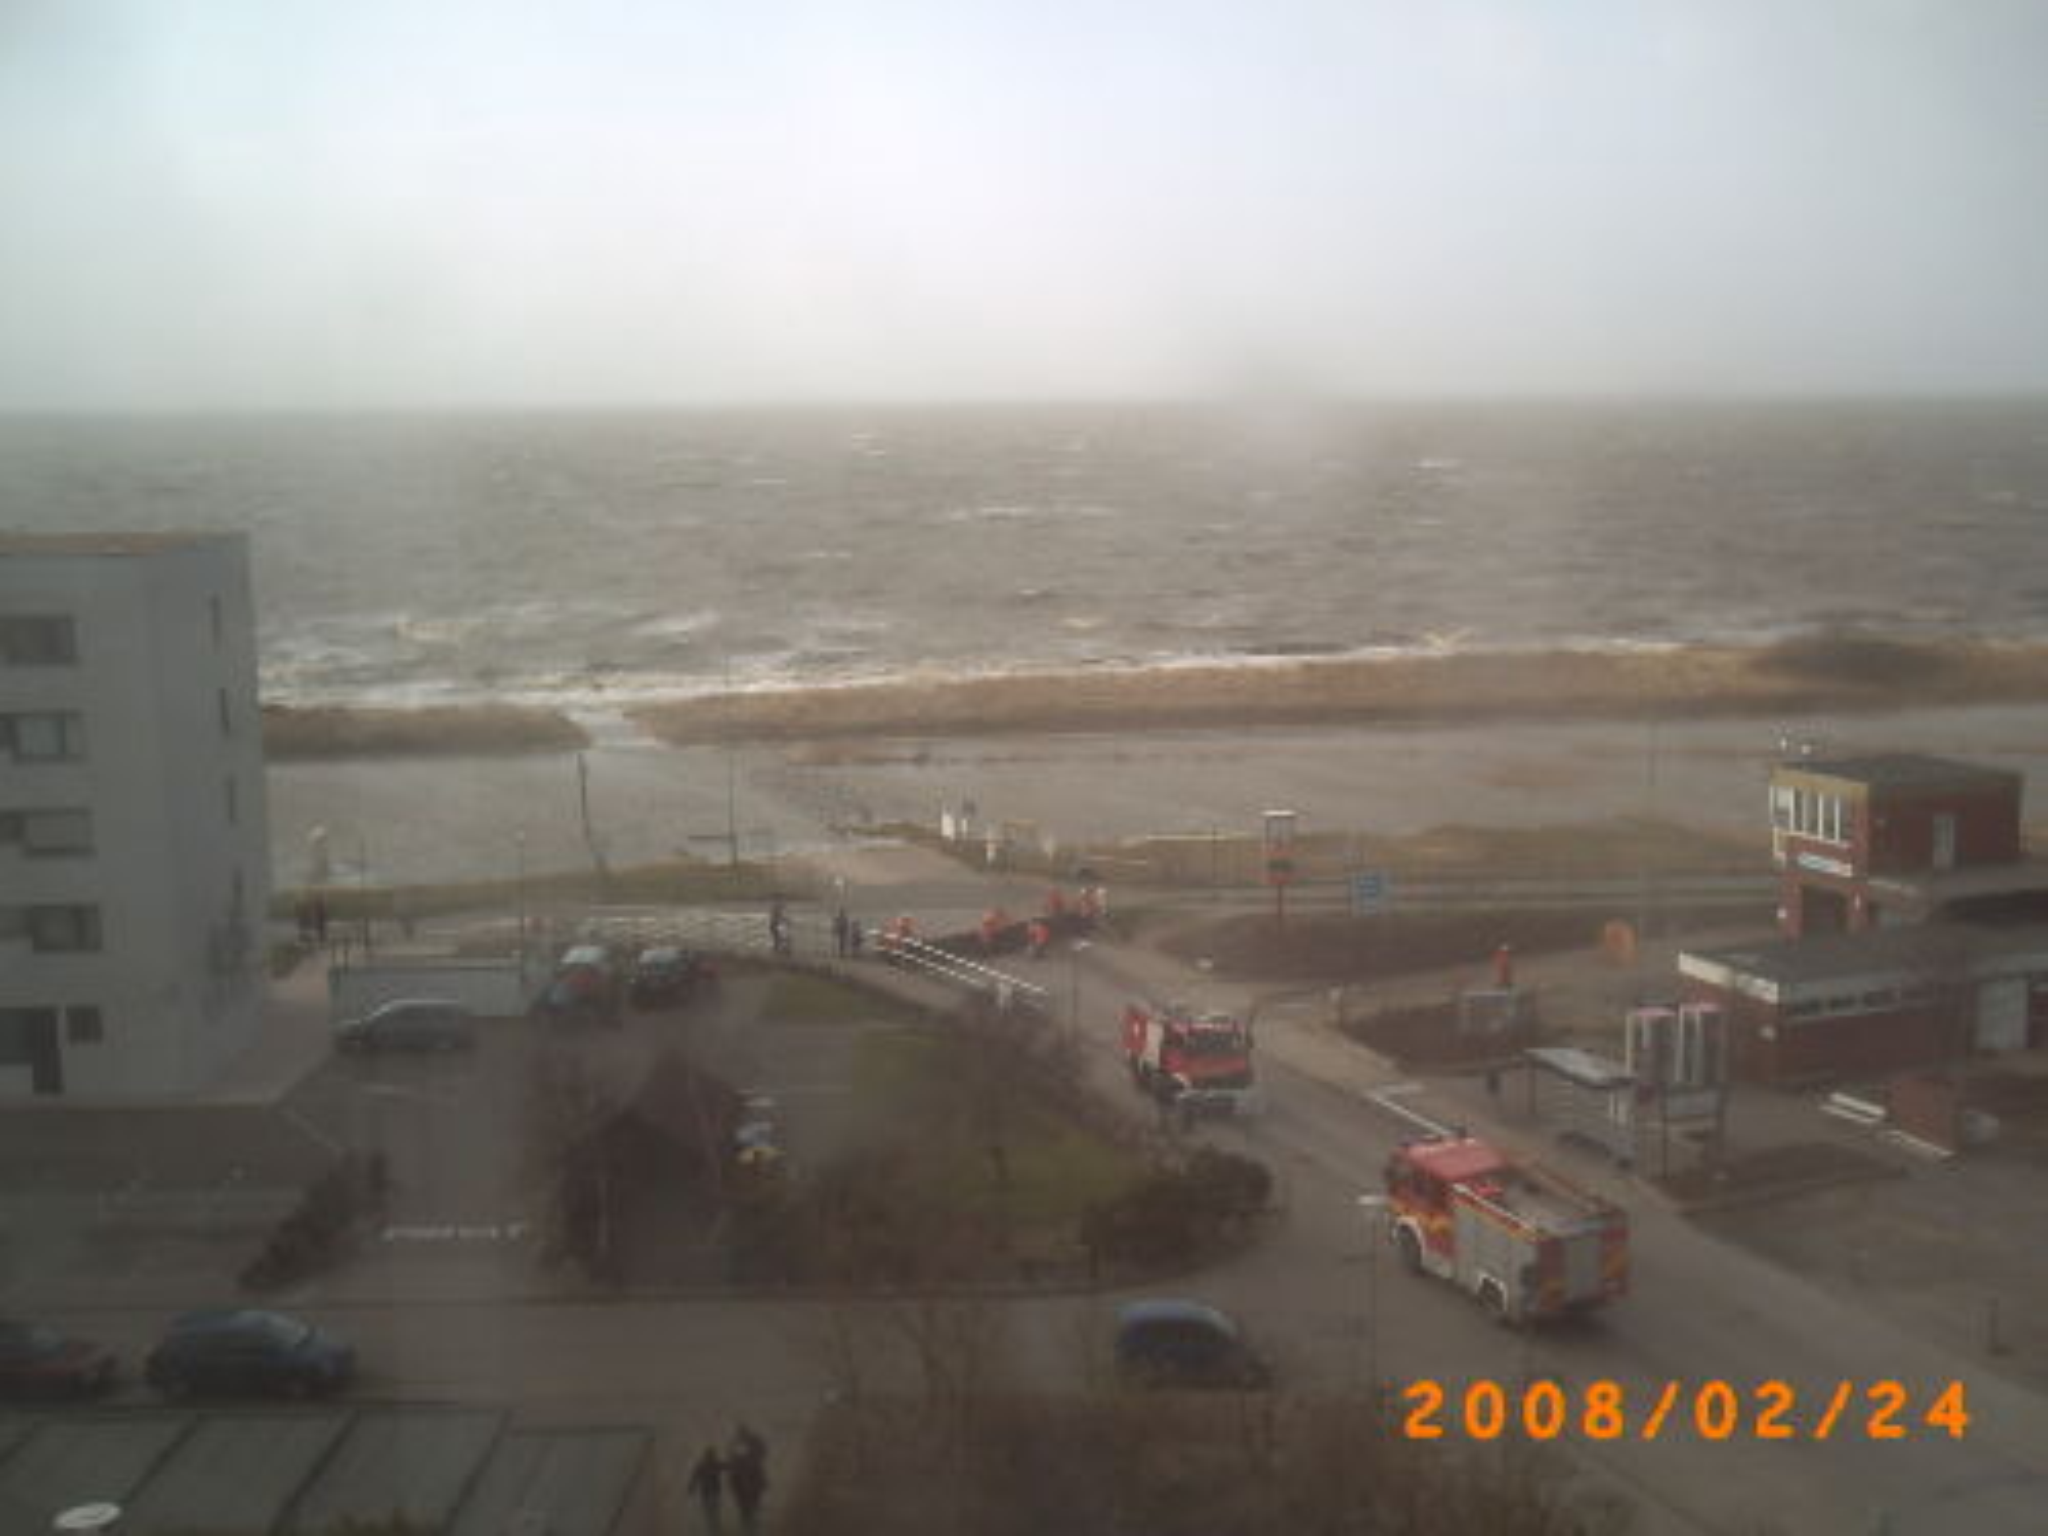 Leichte Sturmflut Feb. 2008